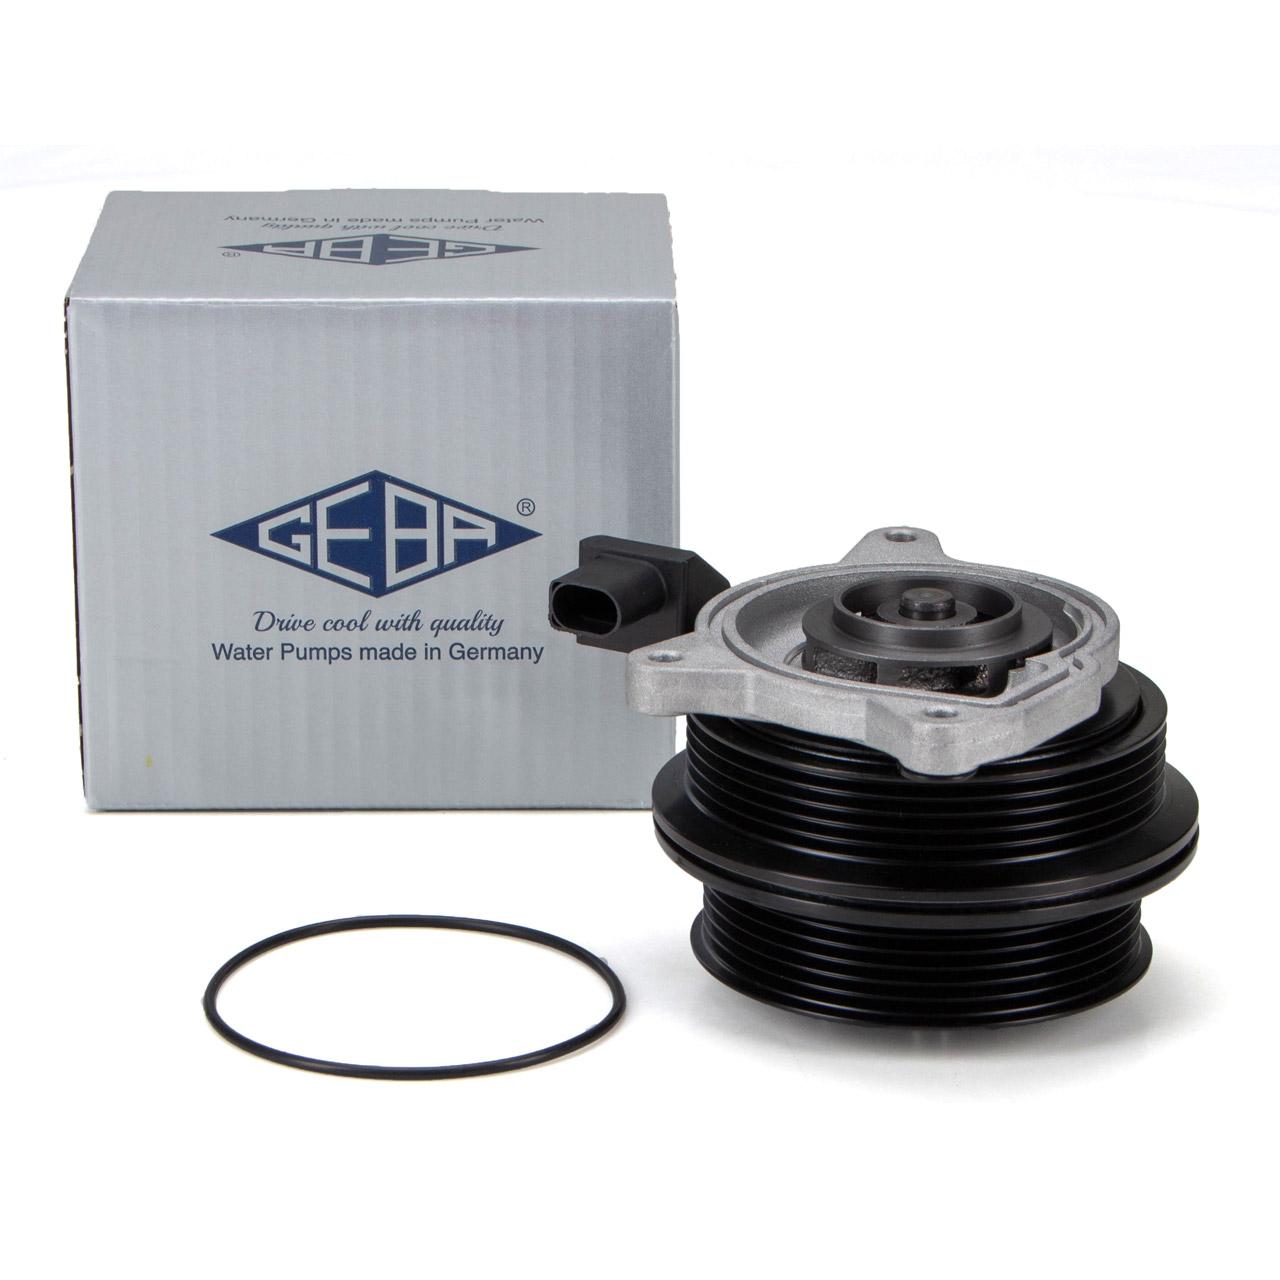 GEBA Wasserpumpe + Dichtung AUDI A1 SKODA VW Golf 5 6 Polo 6R1 6C1 1.4 TFSI/TSI 03C121004J